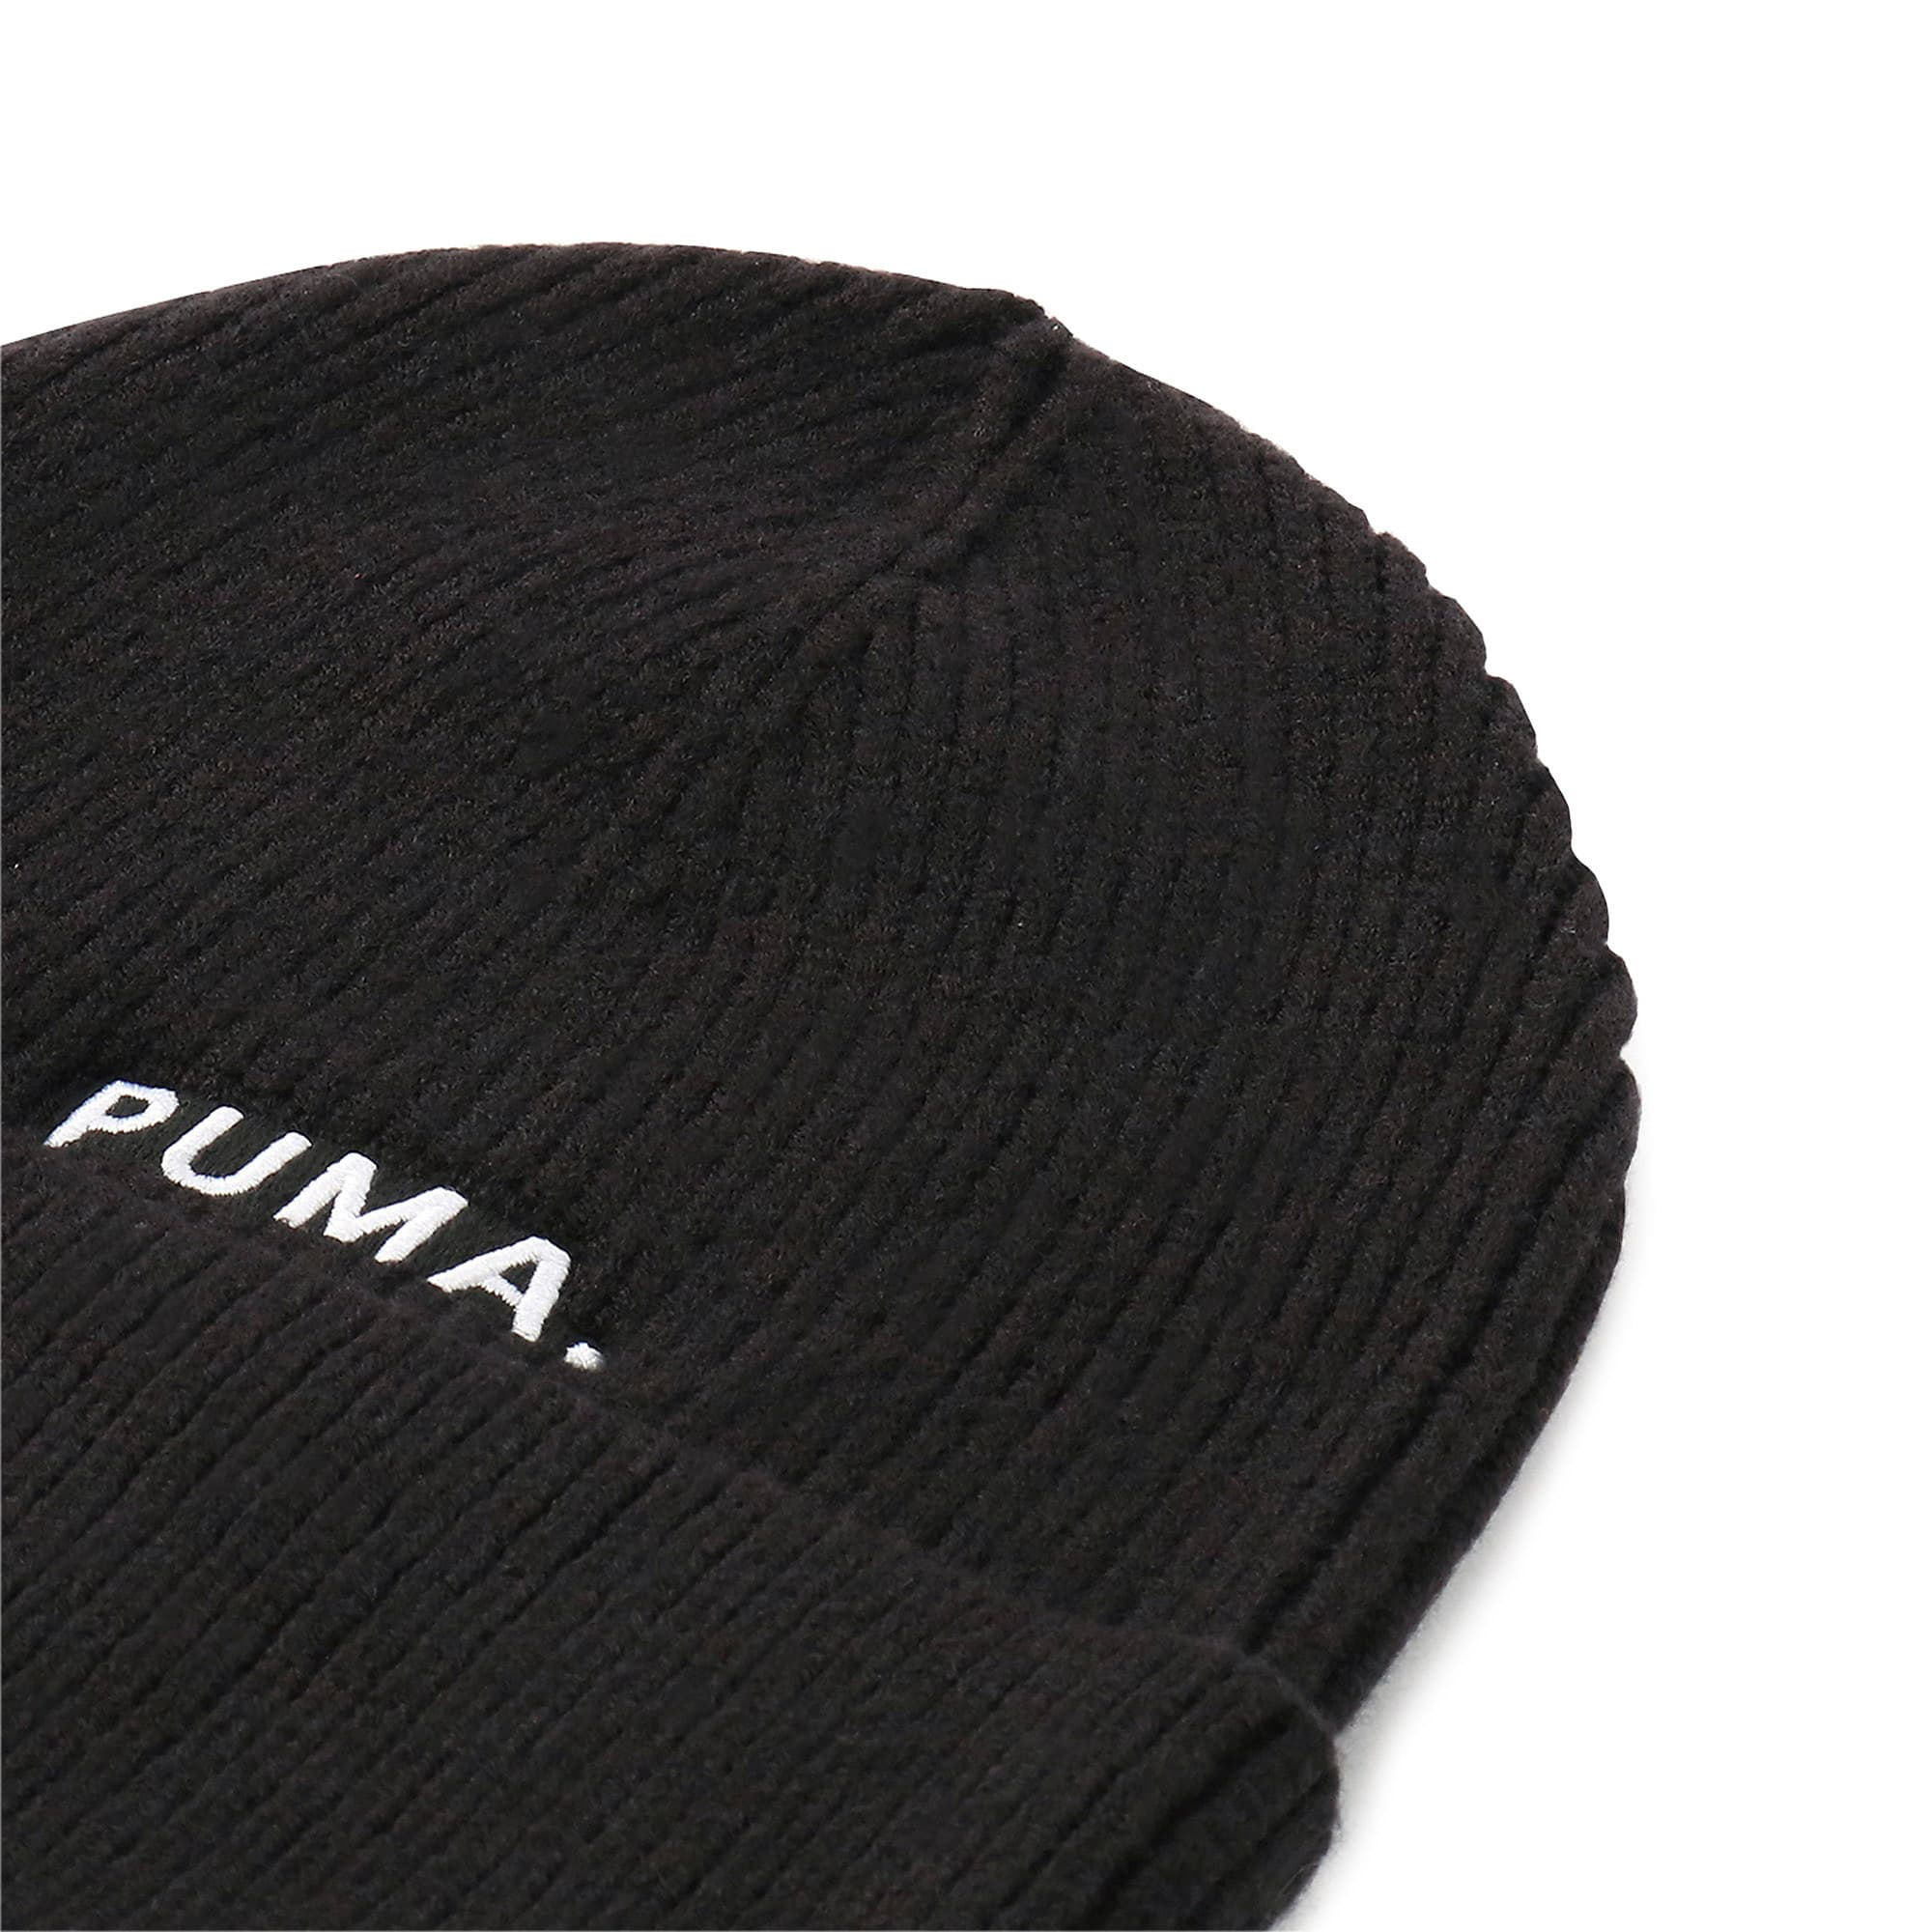 Thumbnail 5 of ハイブリッド フィット ウィメンズ トレンド ビーニー, Puma Black, medium-JPN